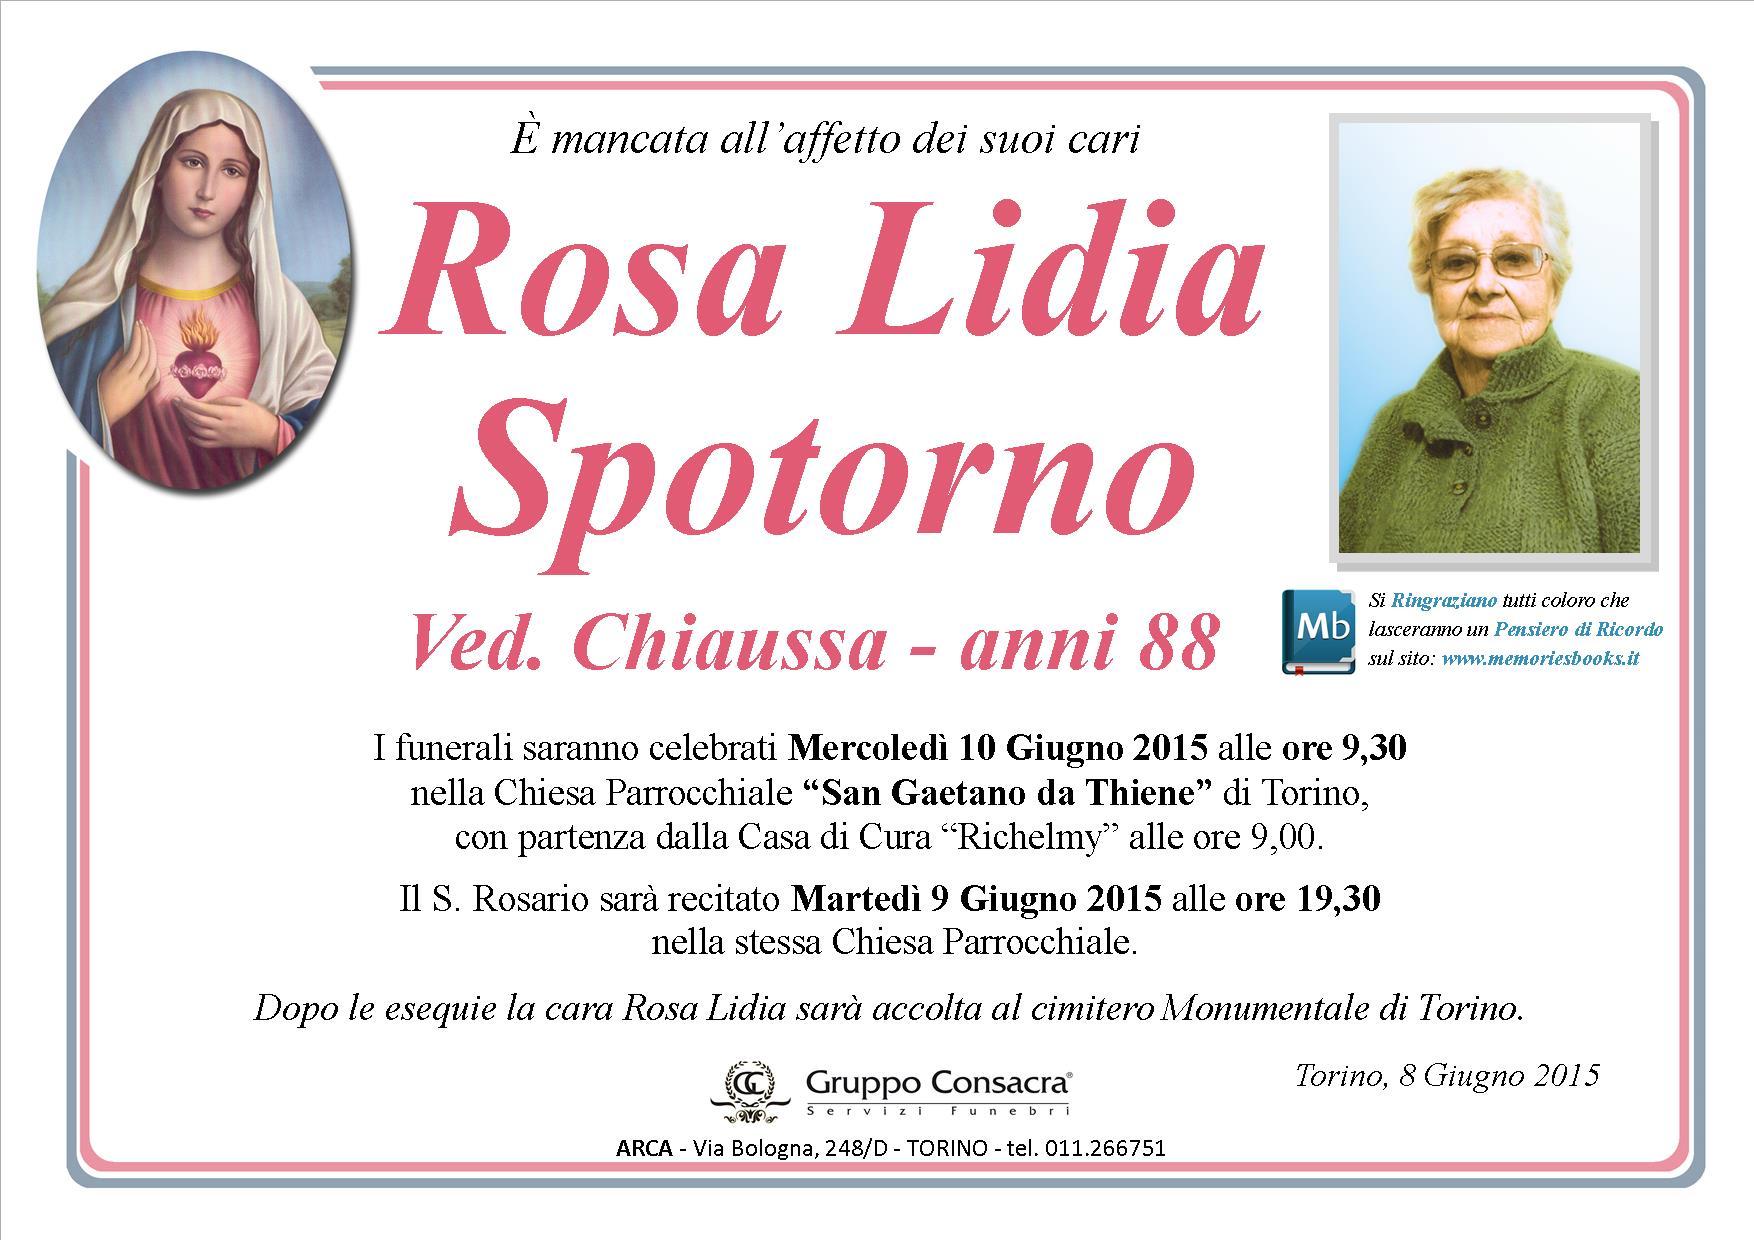 Rosa lidia spotorno chiaussa for Rosa dei mobili torino